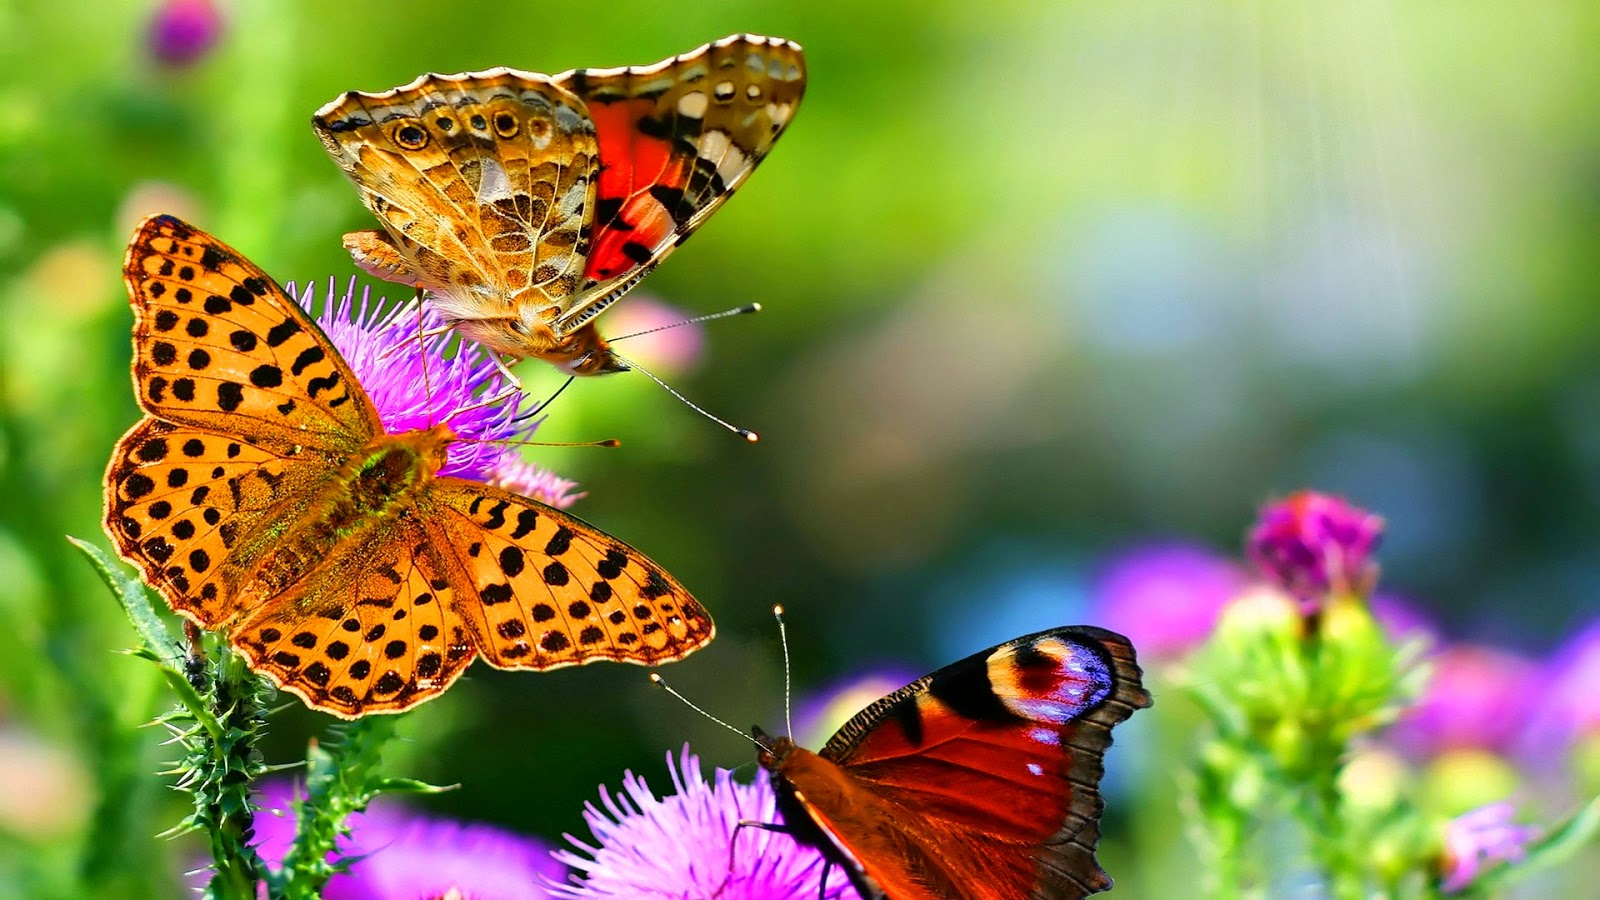 Papel de Parede Natureza Borboletas para pc 3d hd gratis Nature Wallpapers hd free